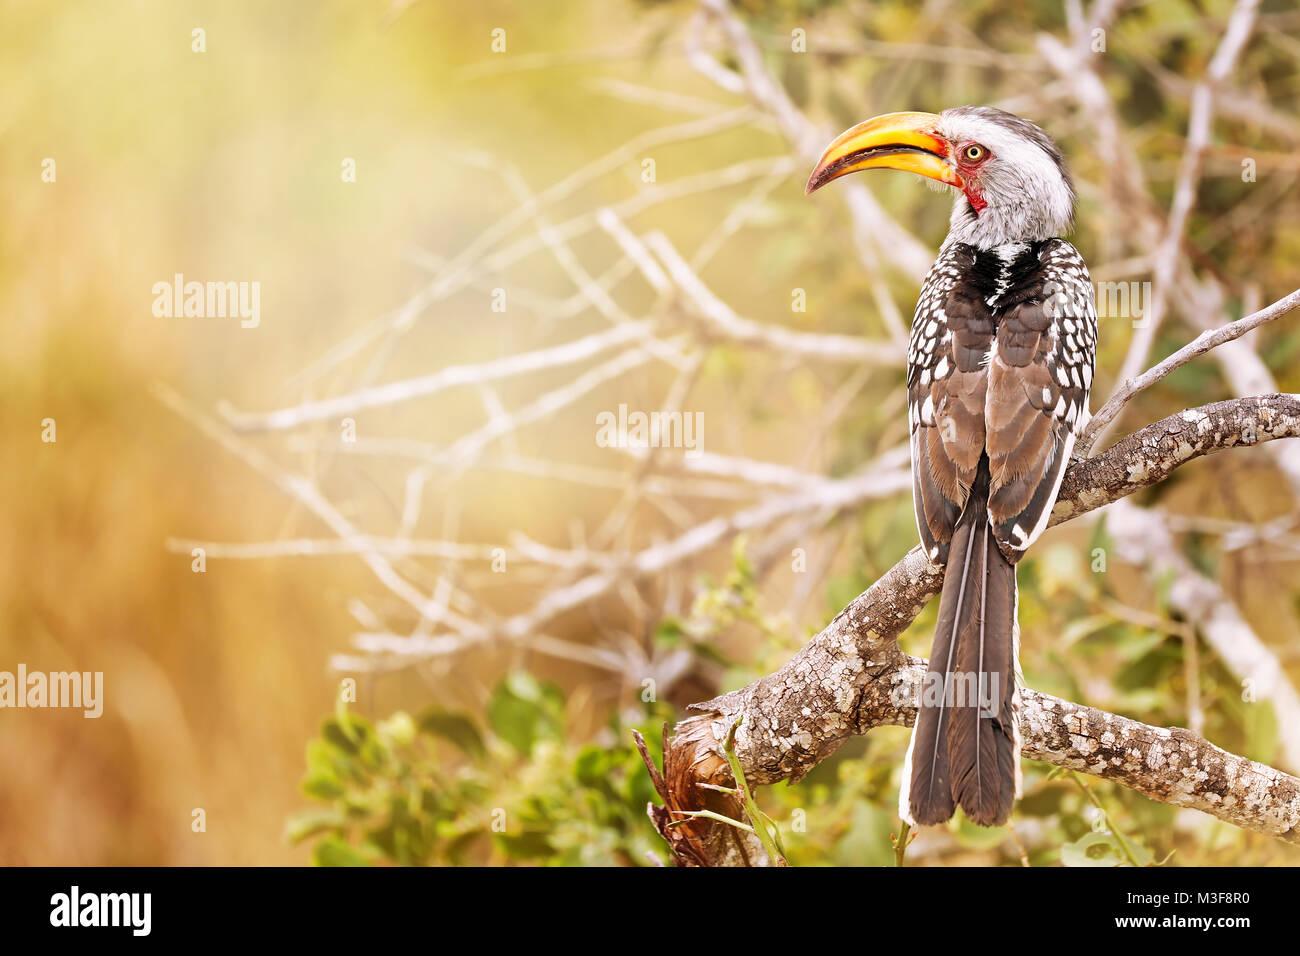 southern yellow-billed hornbill, Tockus leucomelas, Südafrika - Stock Image